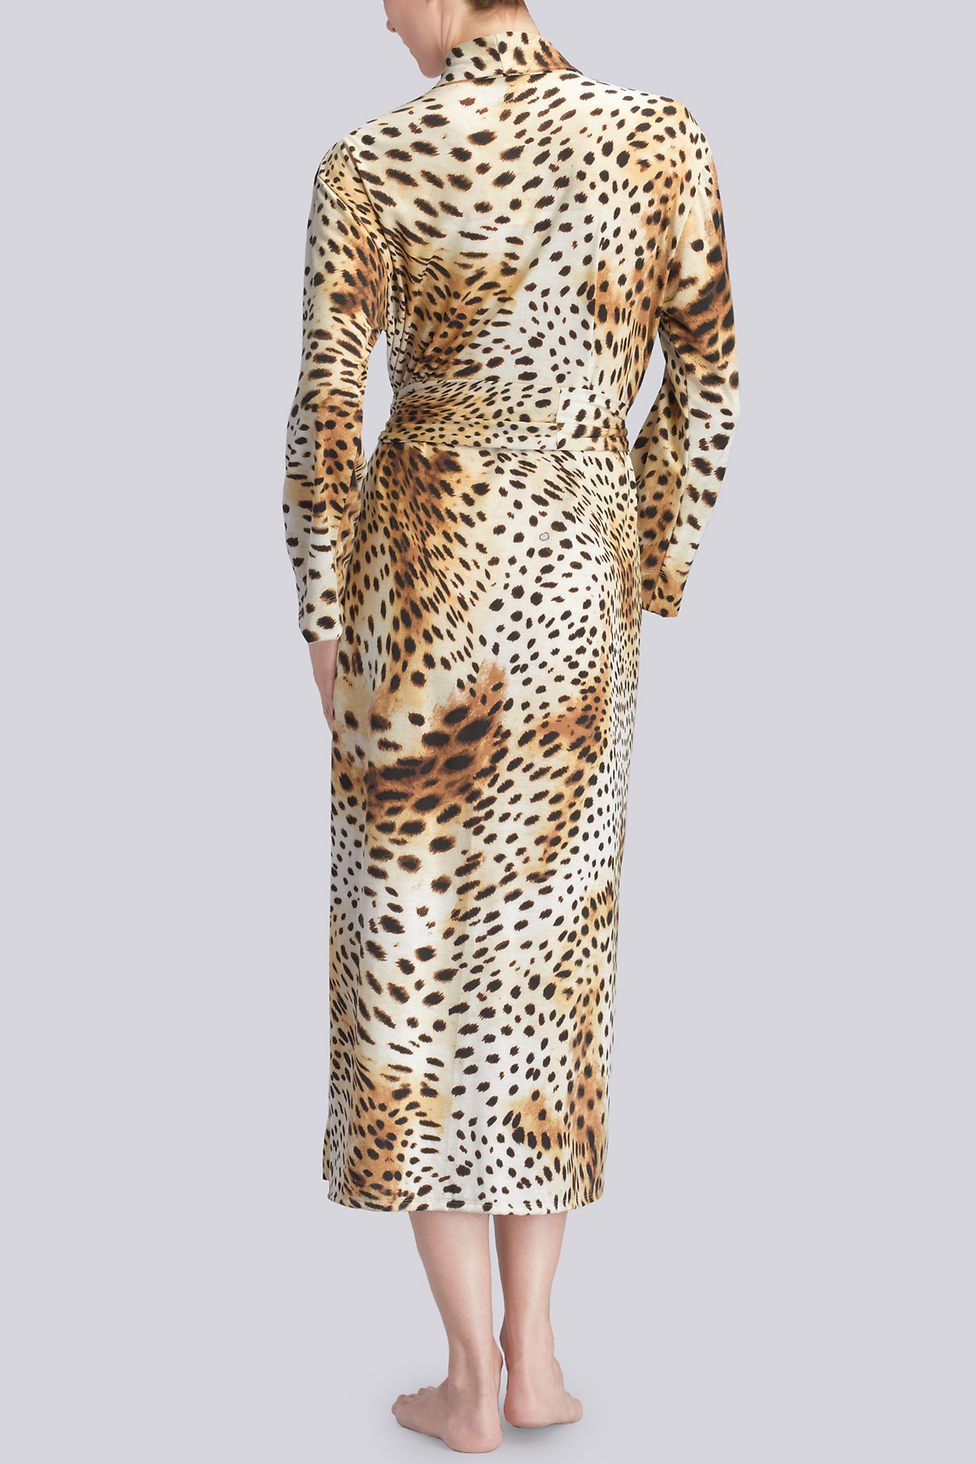 Lyst - Natori Gabon Robe in Natural 55b358de6